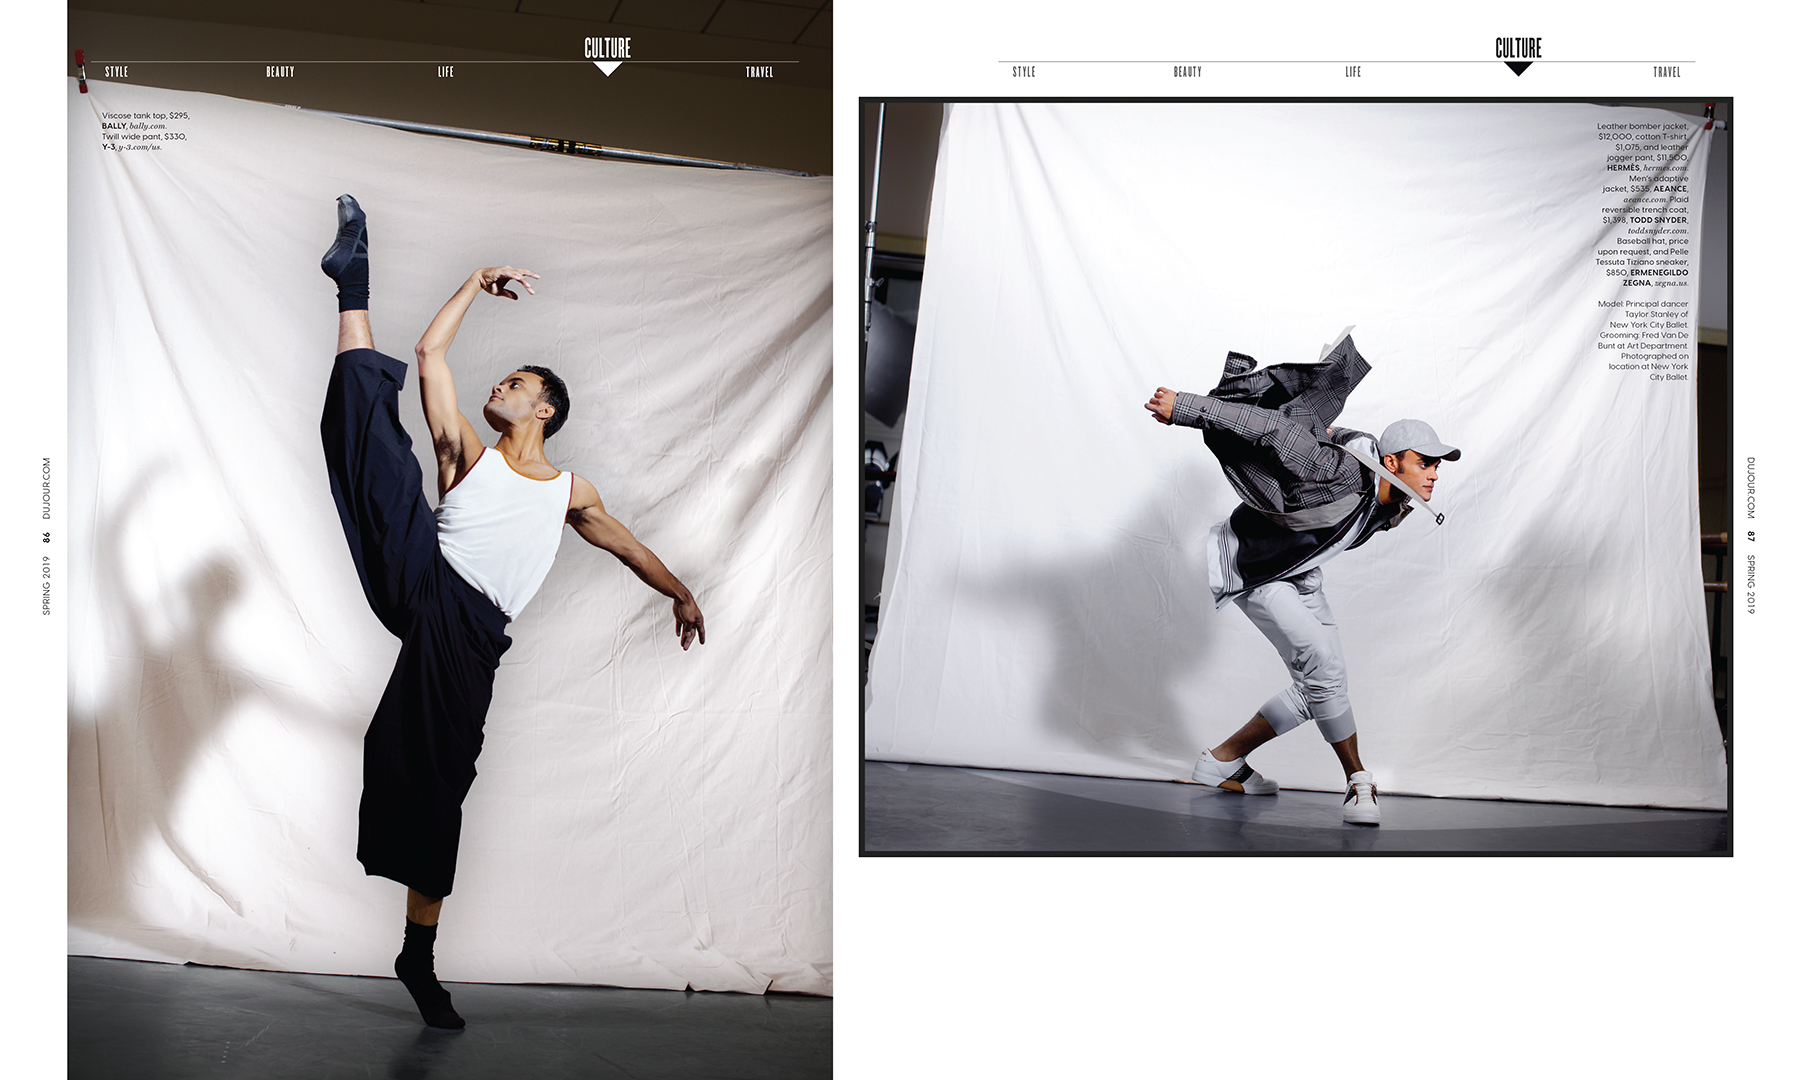 086_DUSPR19_CULTURE_Ballet.jpg